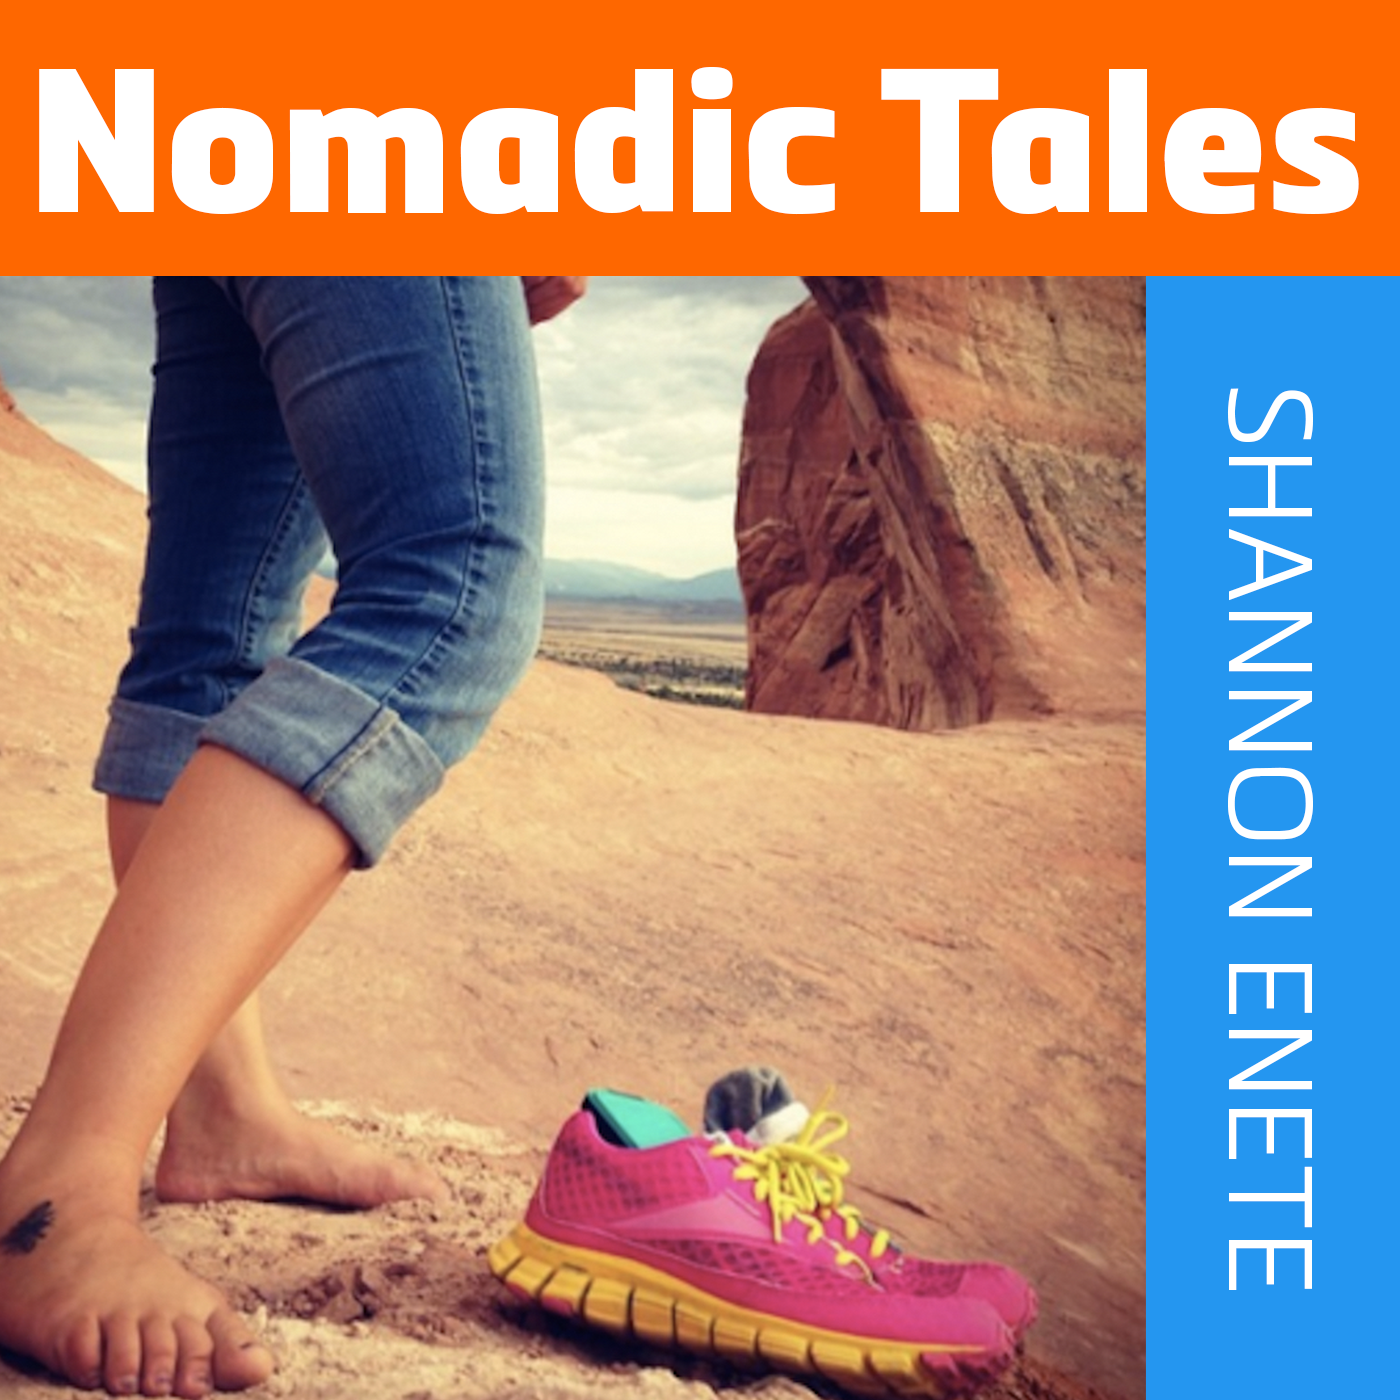 Nomadic Tales